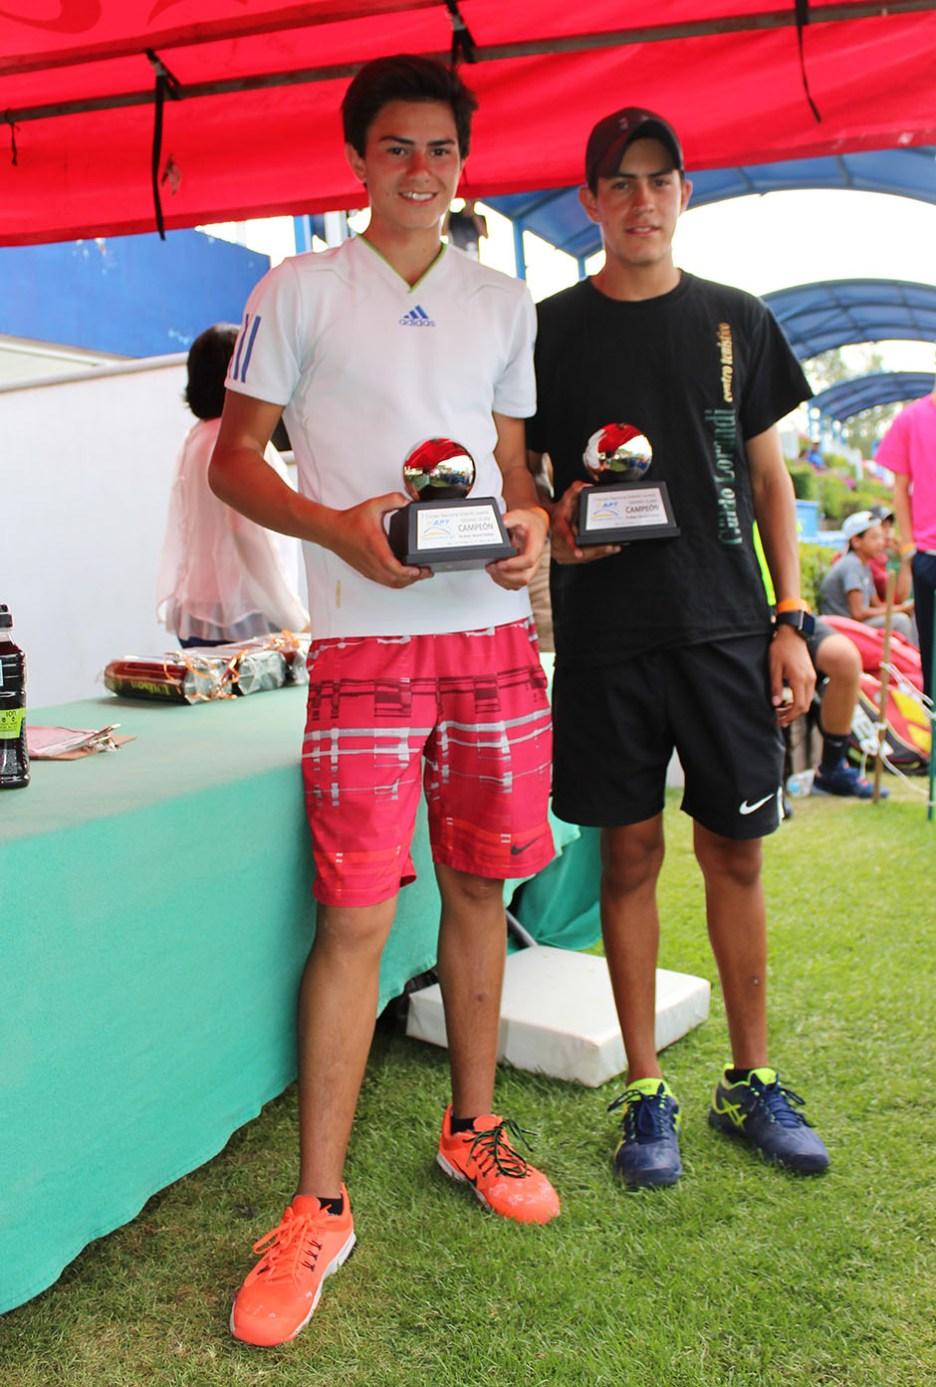 1er Campeonato Nacional Tenis Grand Slam -Campeoness cat 16 años (dobles)